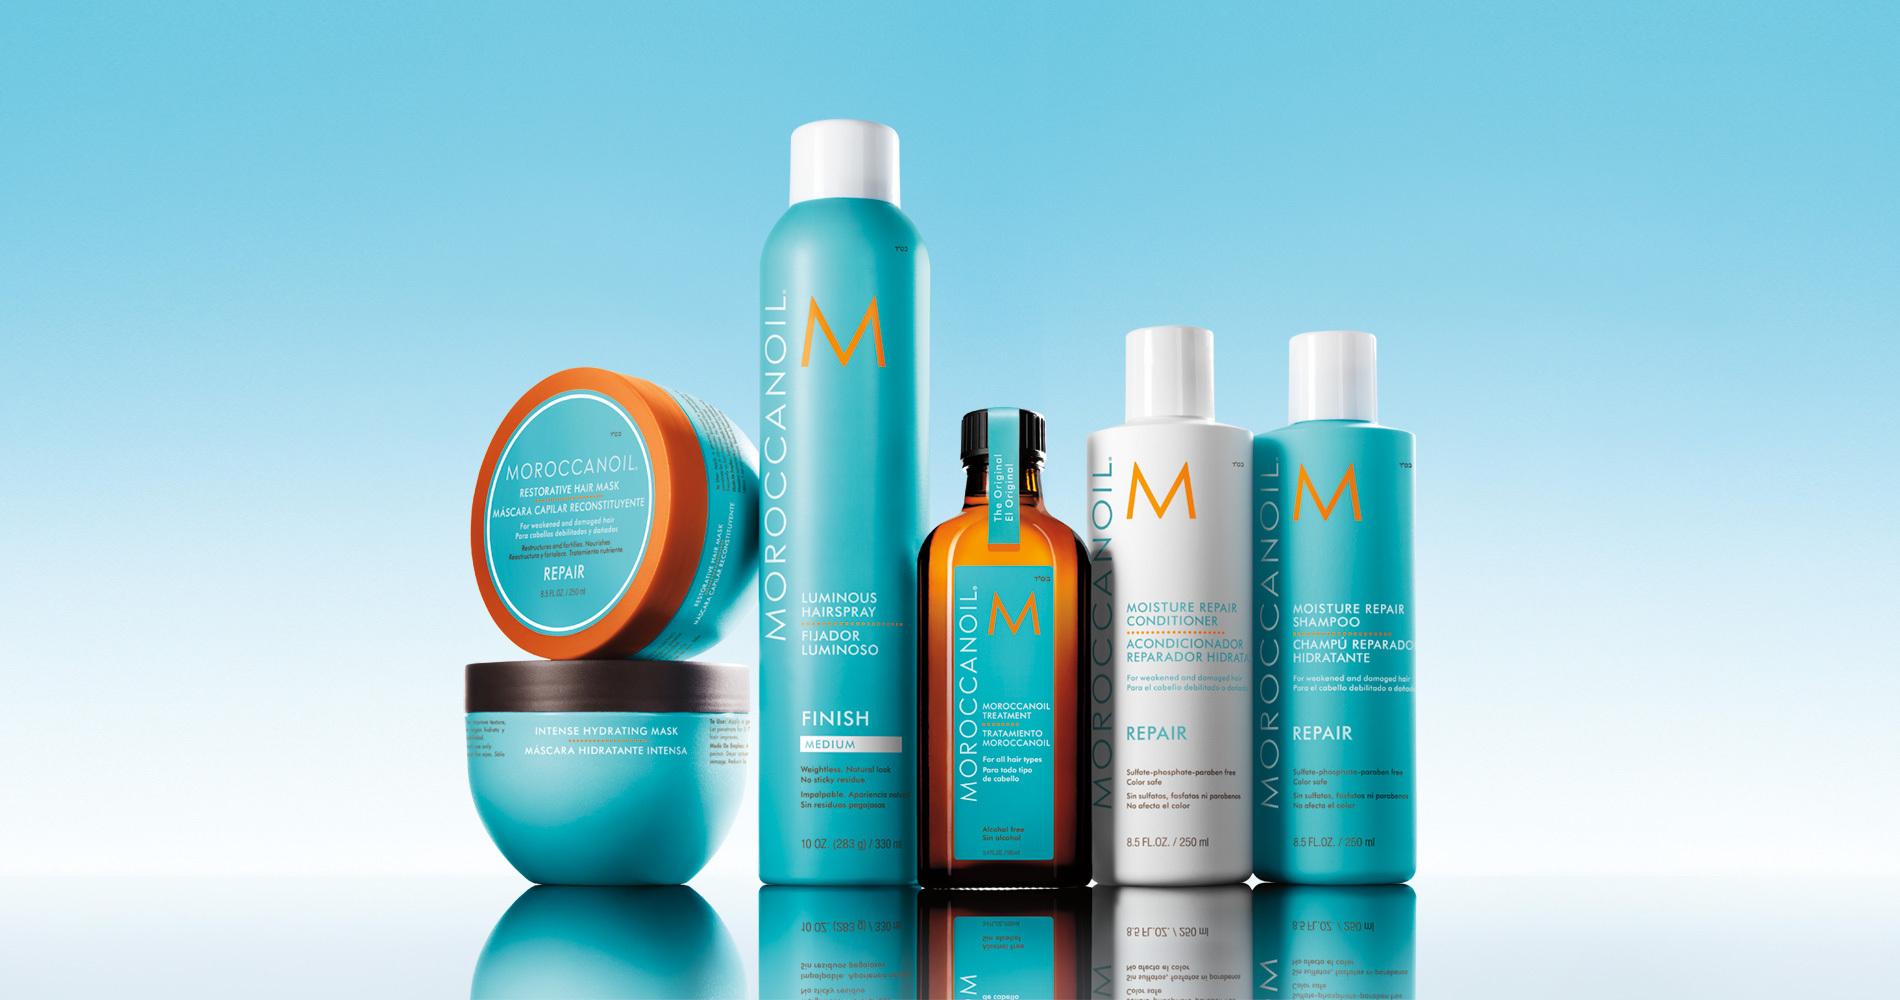 http://hairbyadelle.files.wordpress.com/2012/03/moroccan-oil-products.jpg